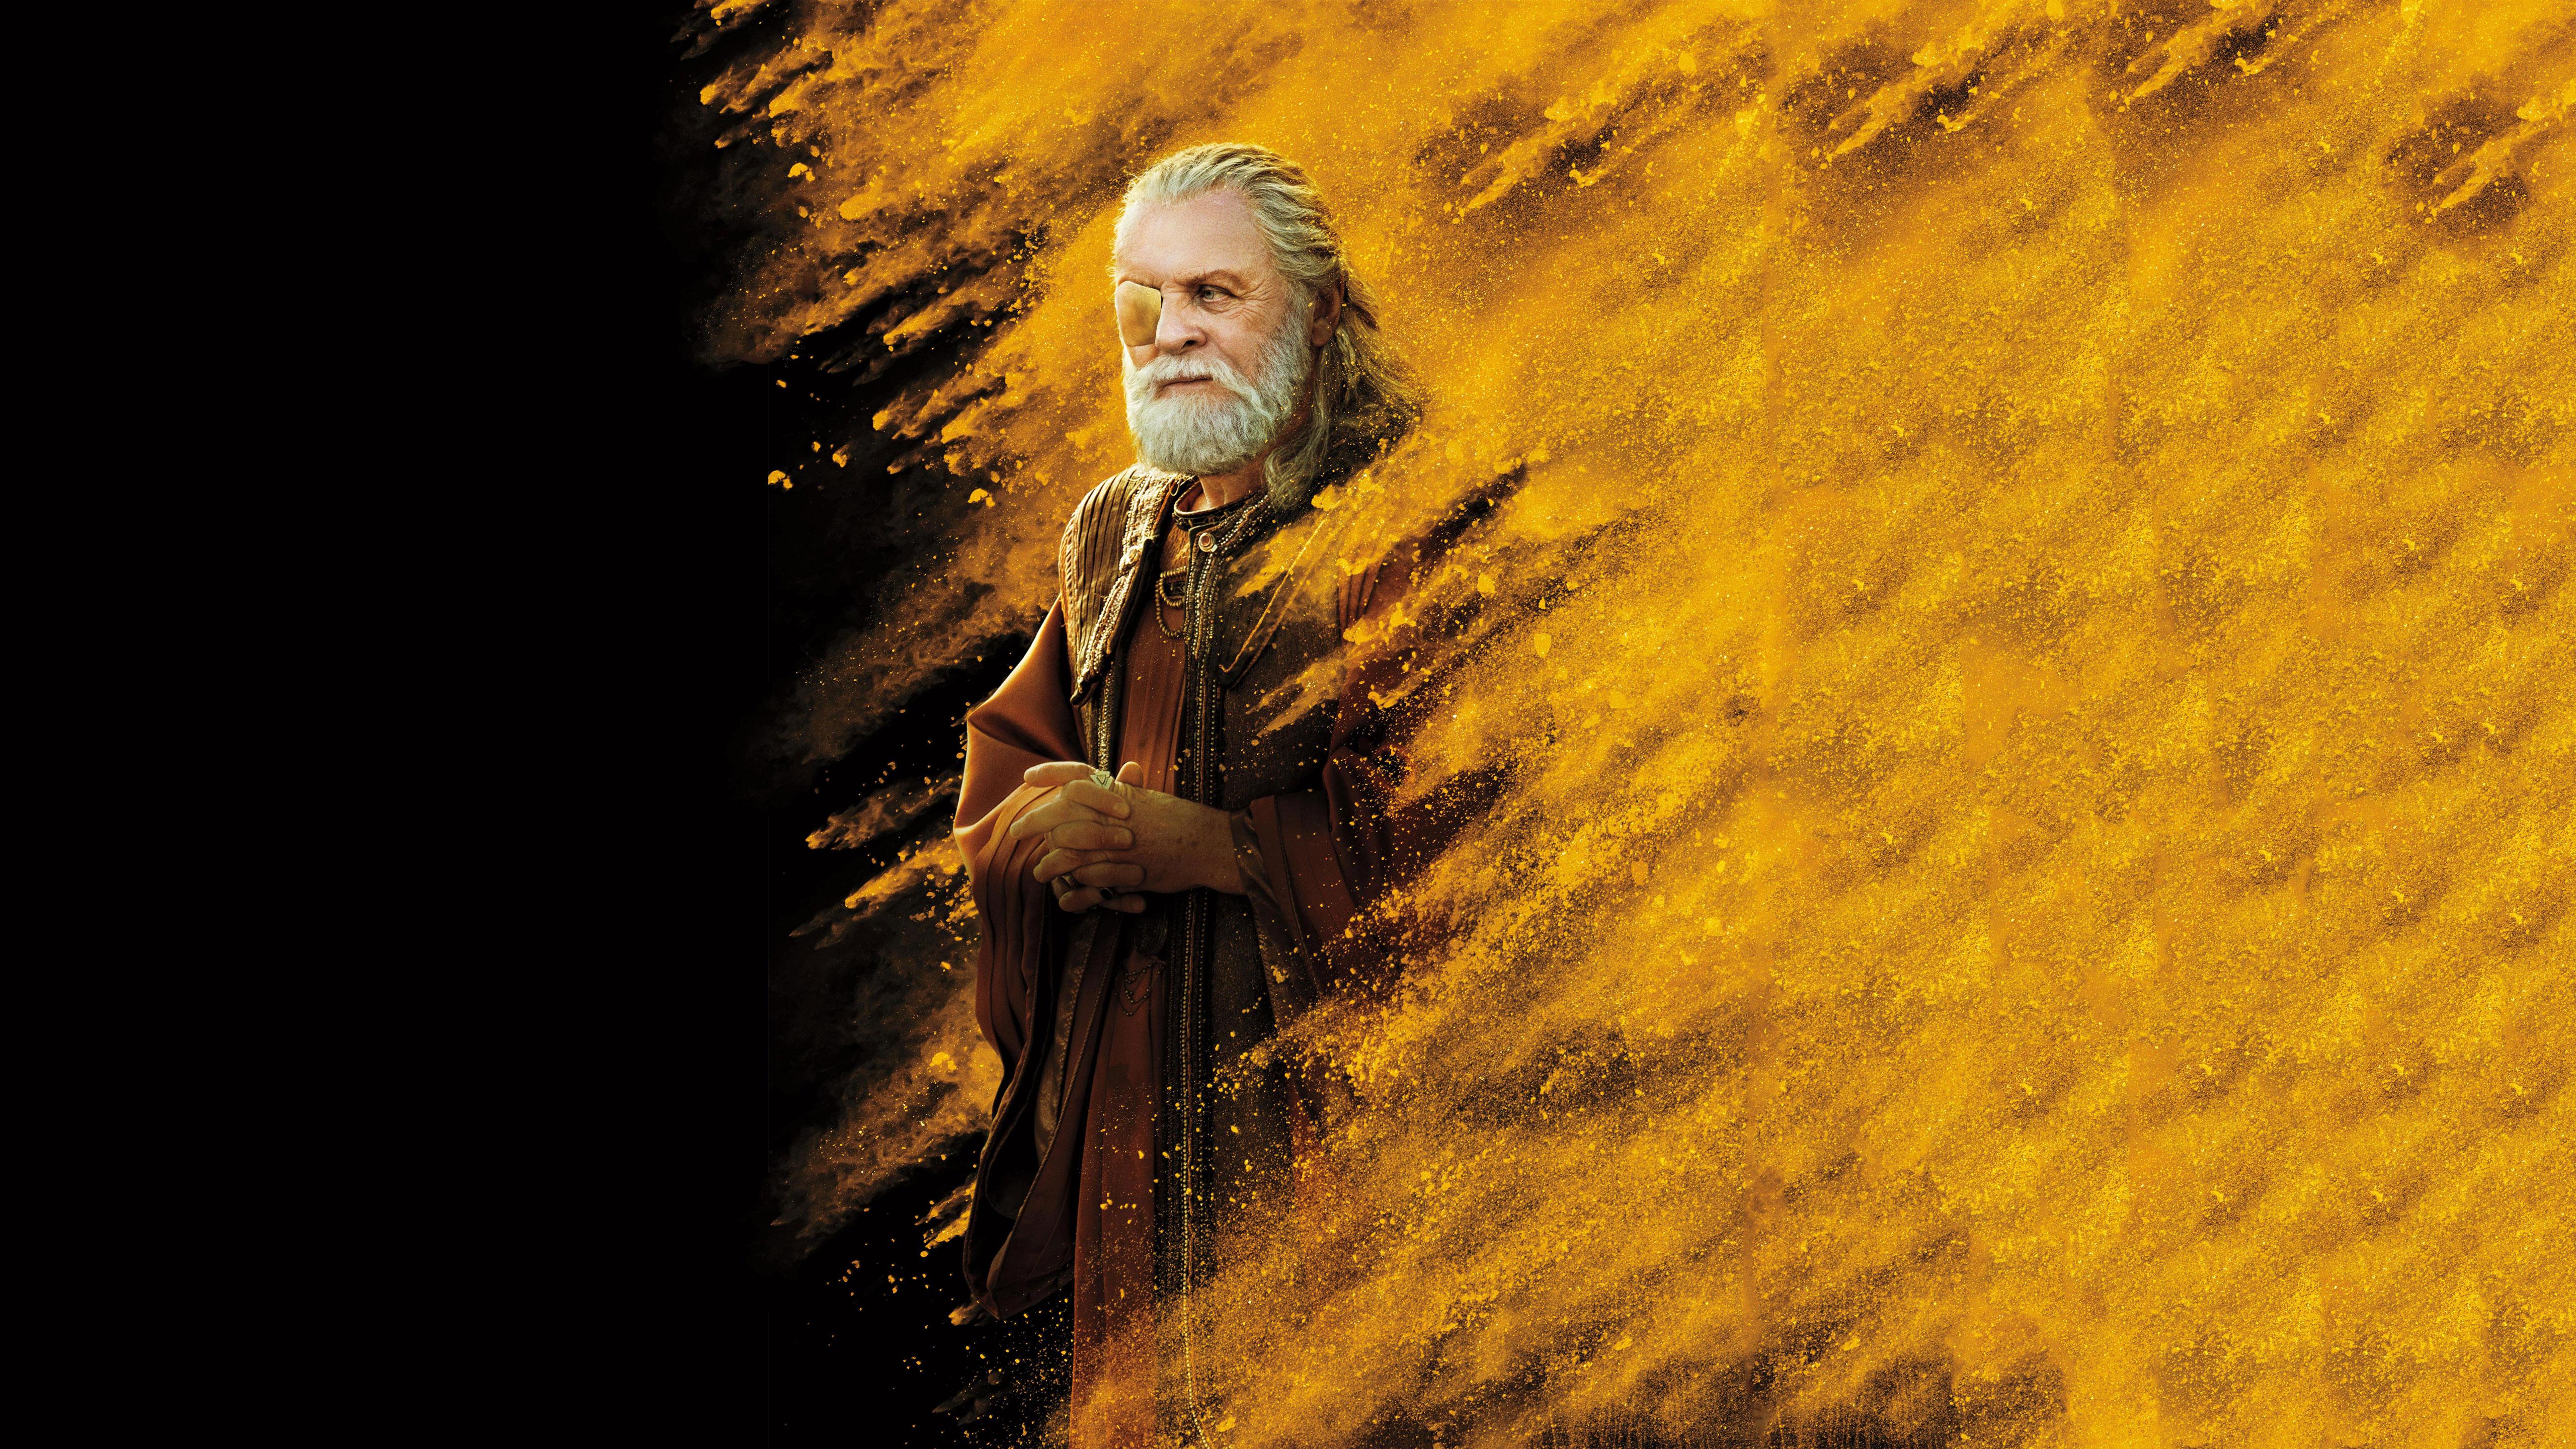 Odin thor ragnarok 2017 5k hd movies 4k wallpapers - Thor ragnarok hd wallpapers download ...